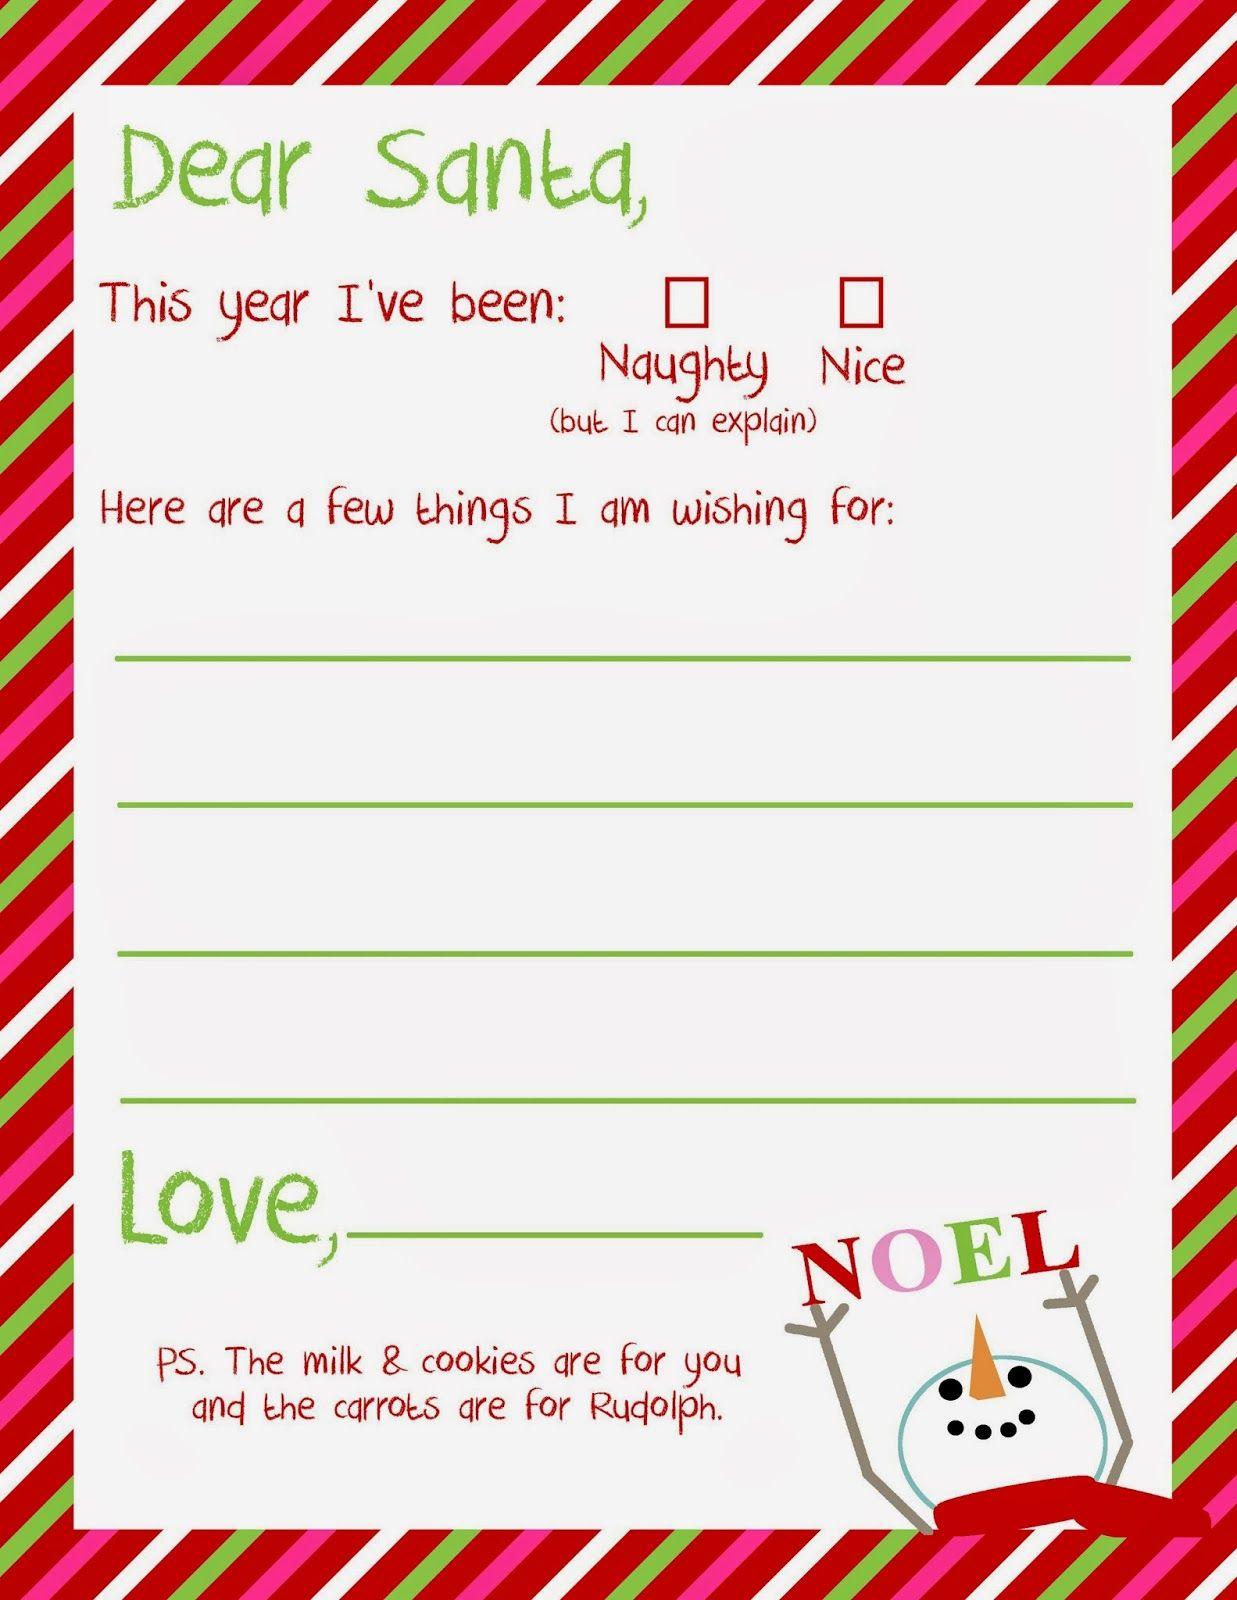 Dear Santa Letter Printable Dear santa letter, Christmas